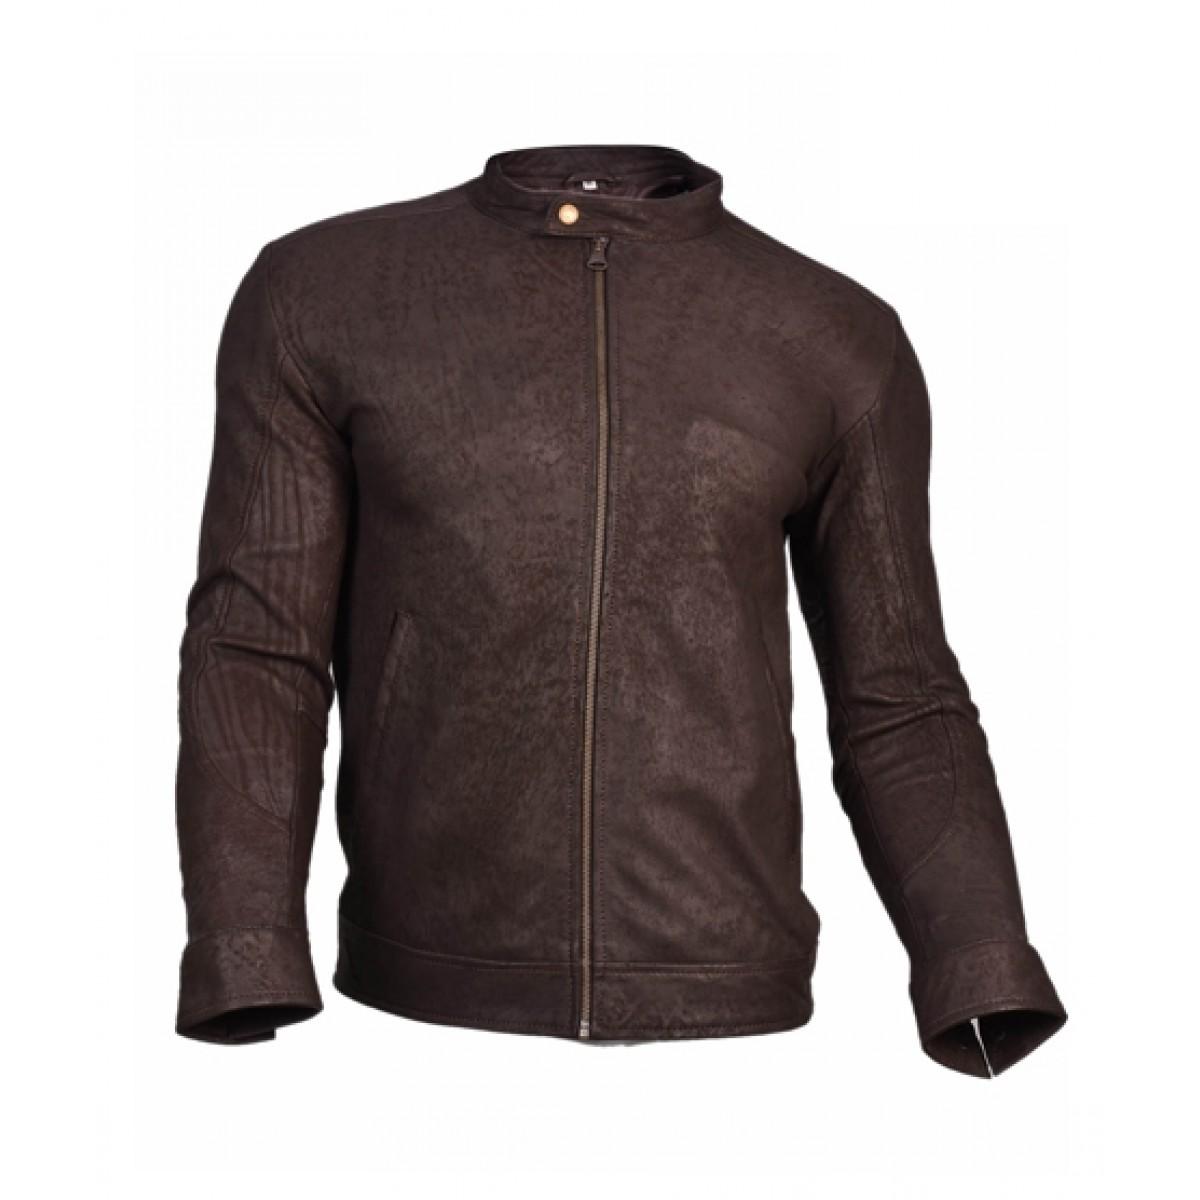 fef4daba6 Rubian Store Leather Jacket For Men Price in Pakistan